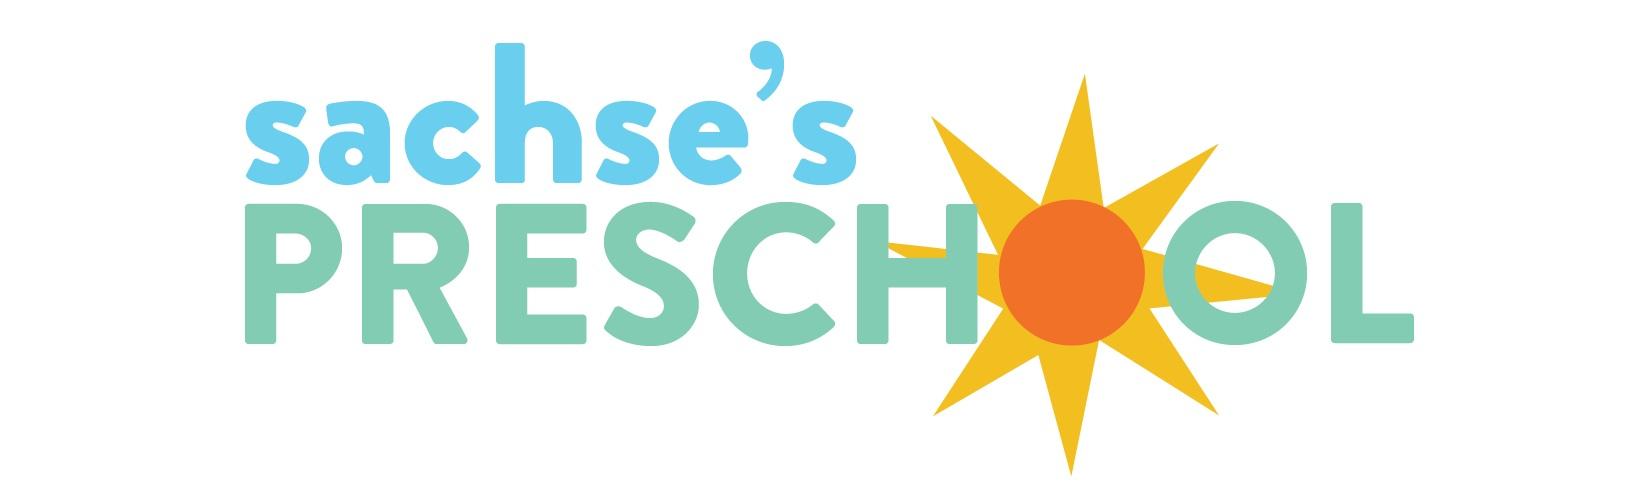 preschool+logo